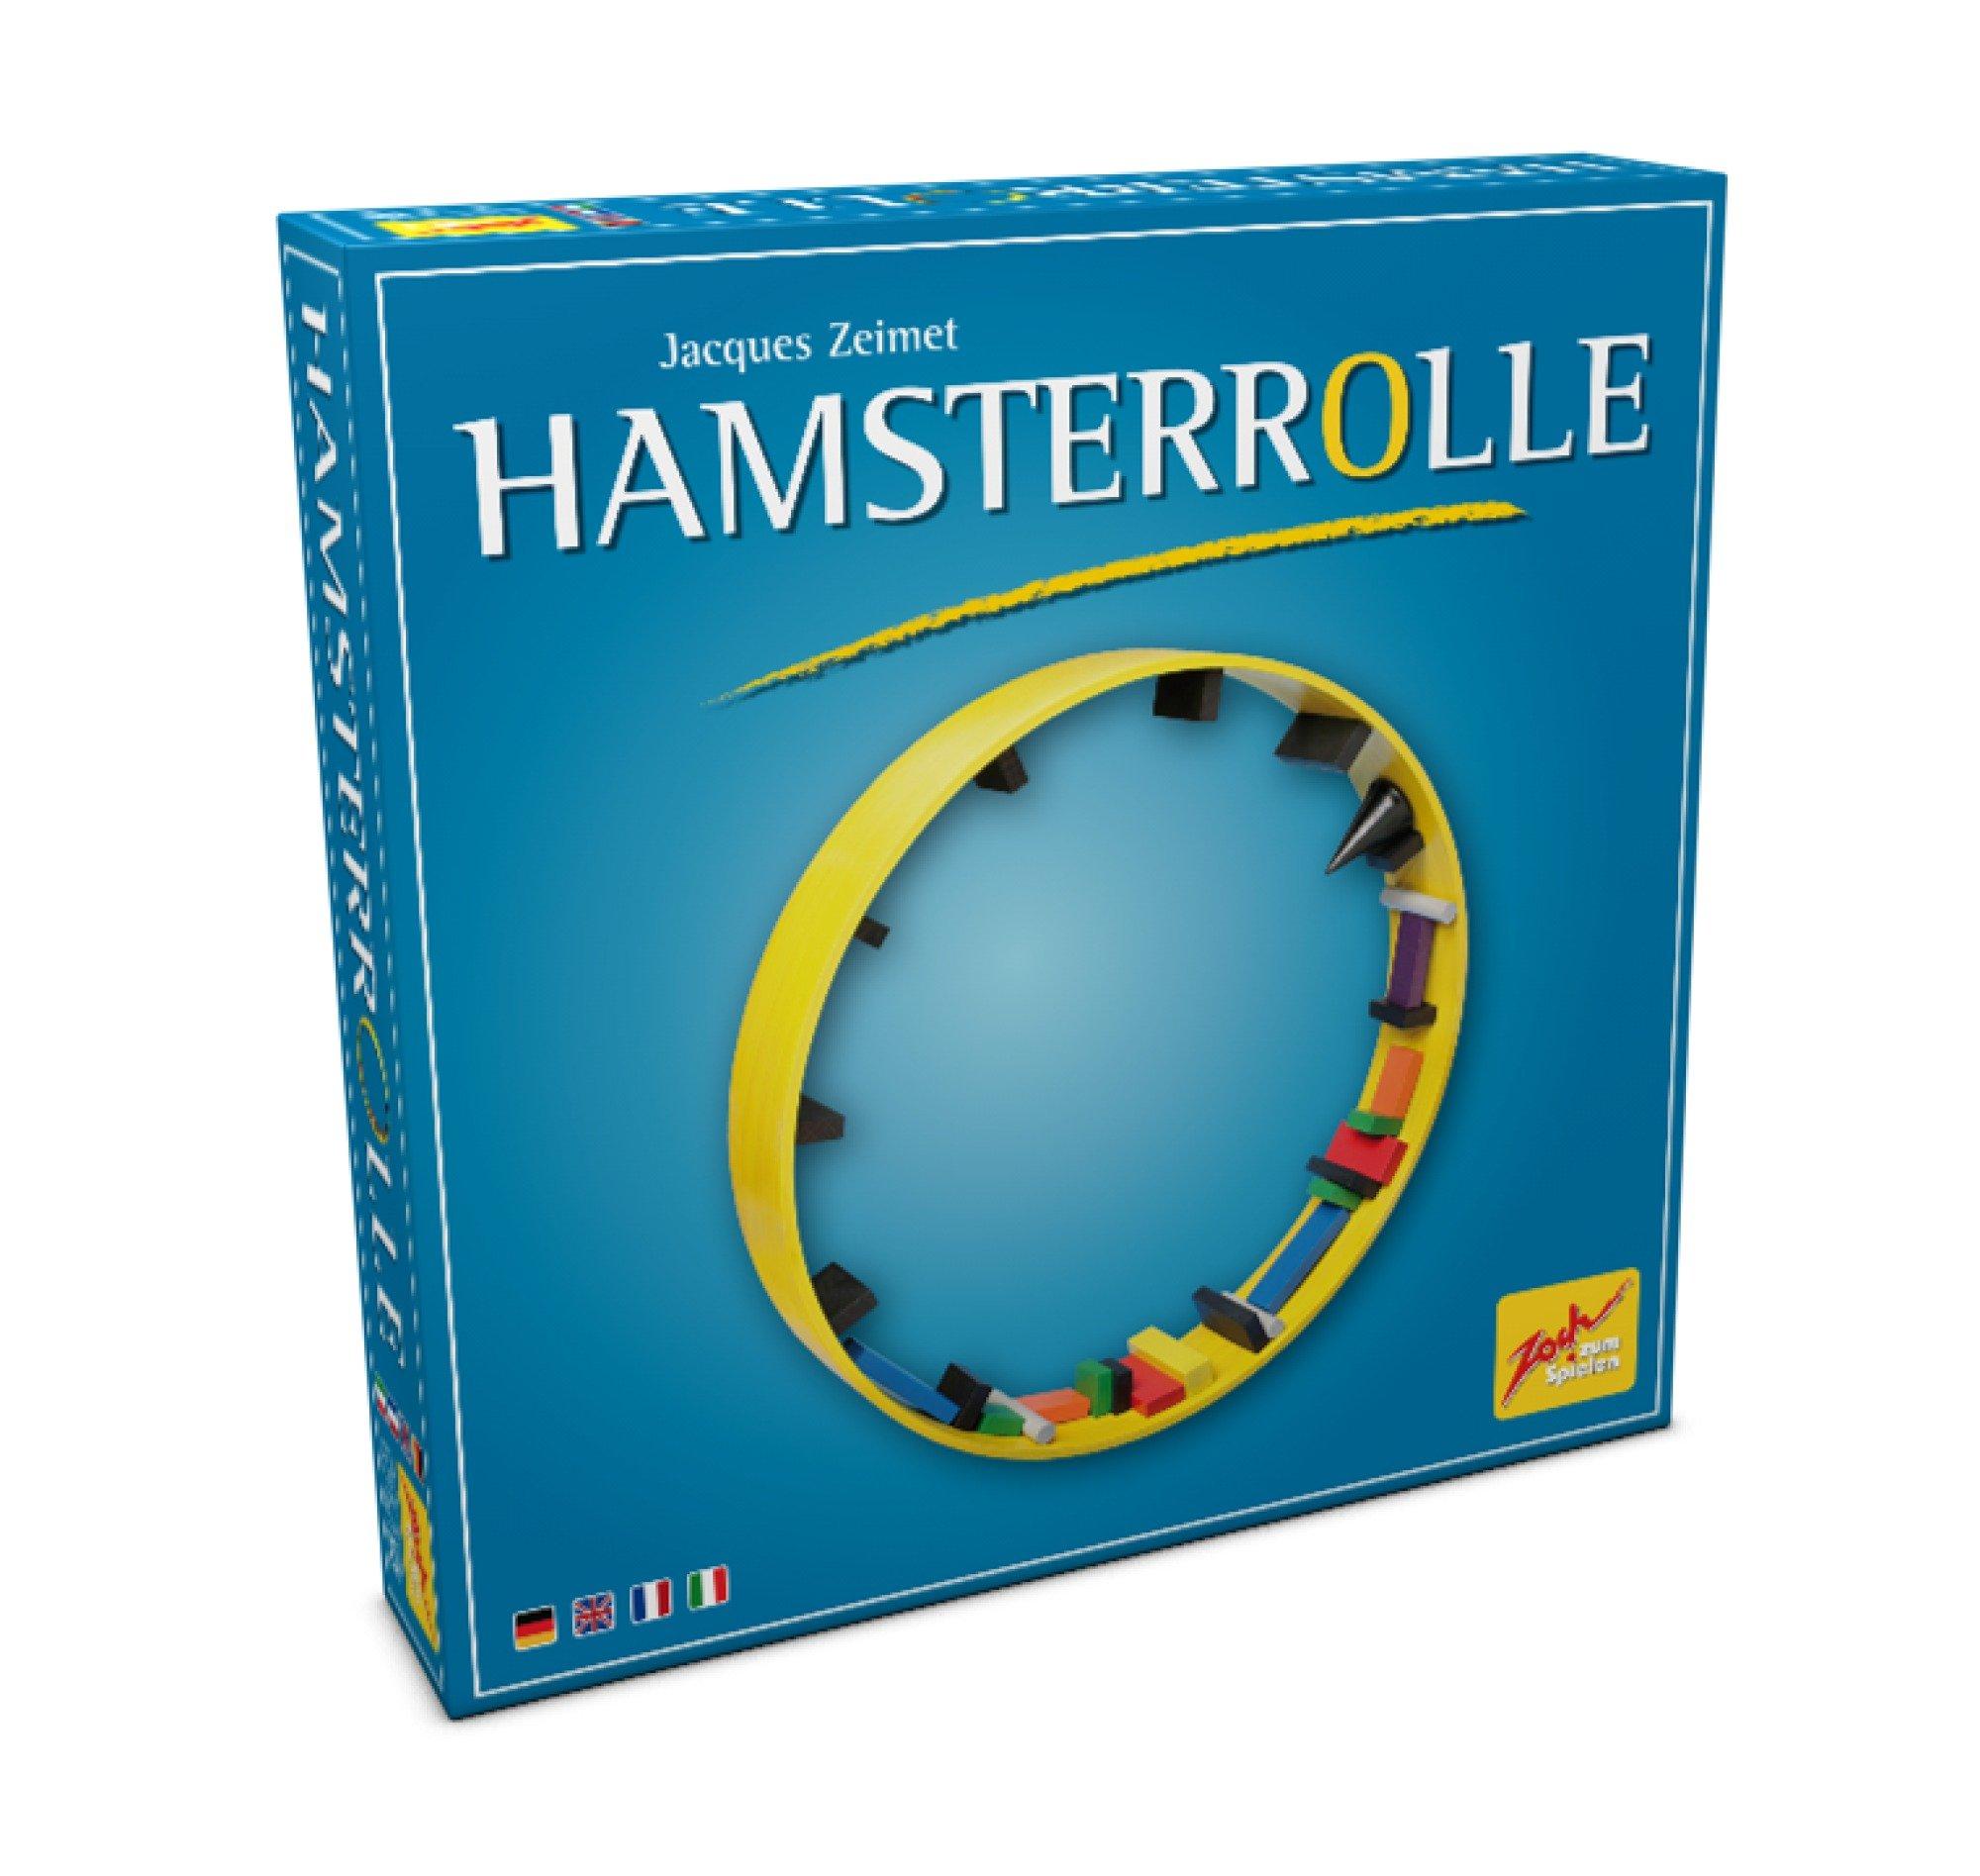 Zoch Verlag Hamsterrolle Stacking Game